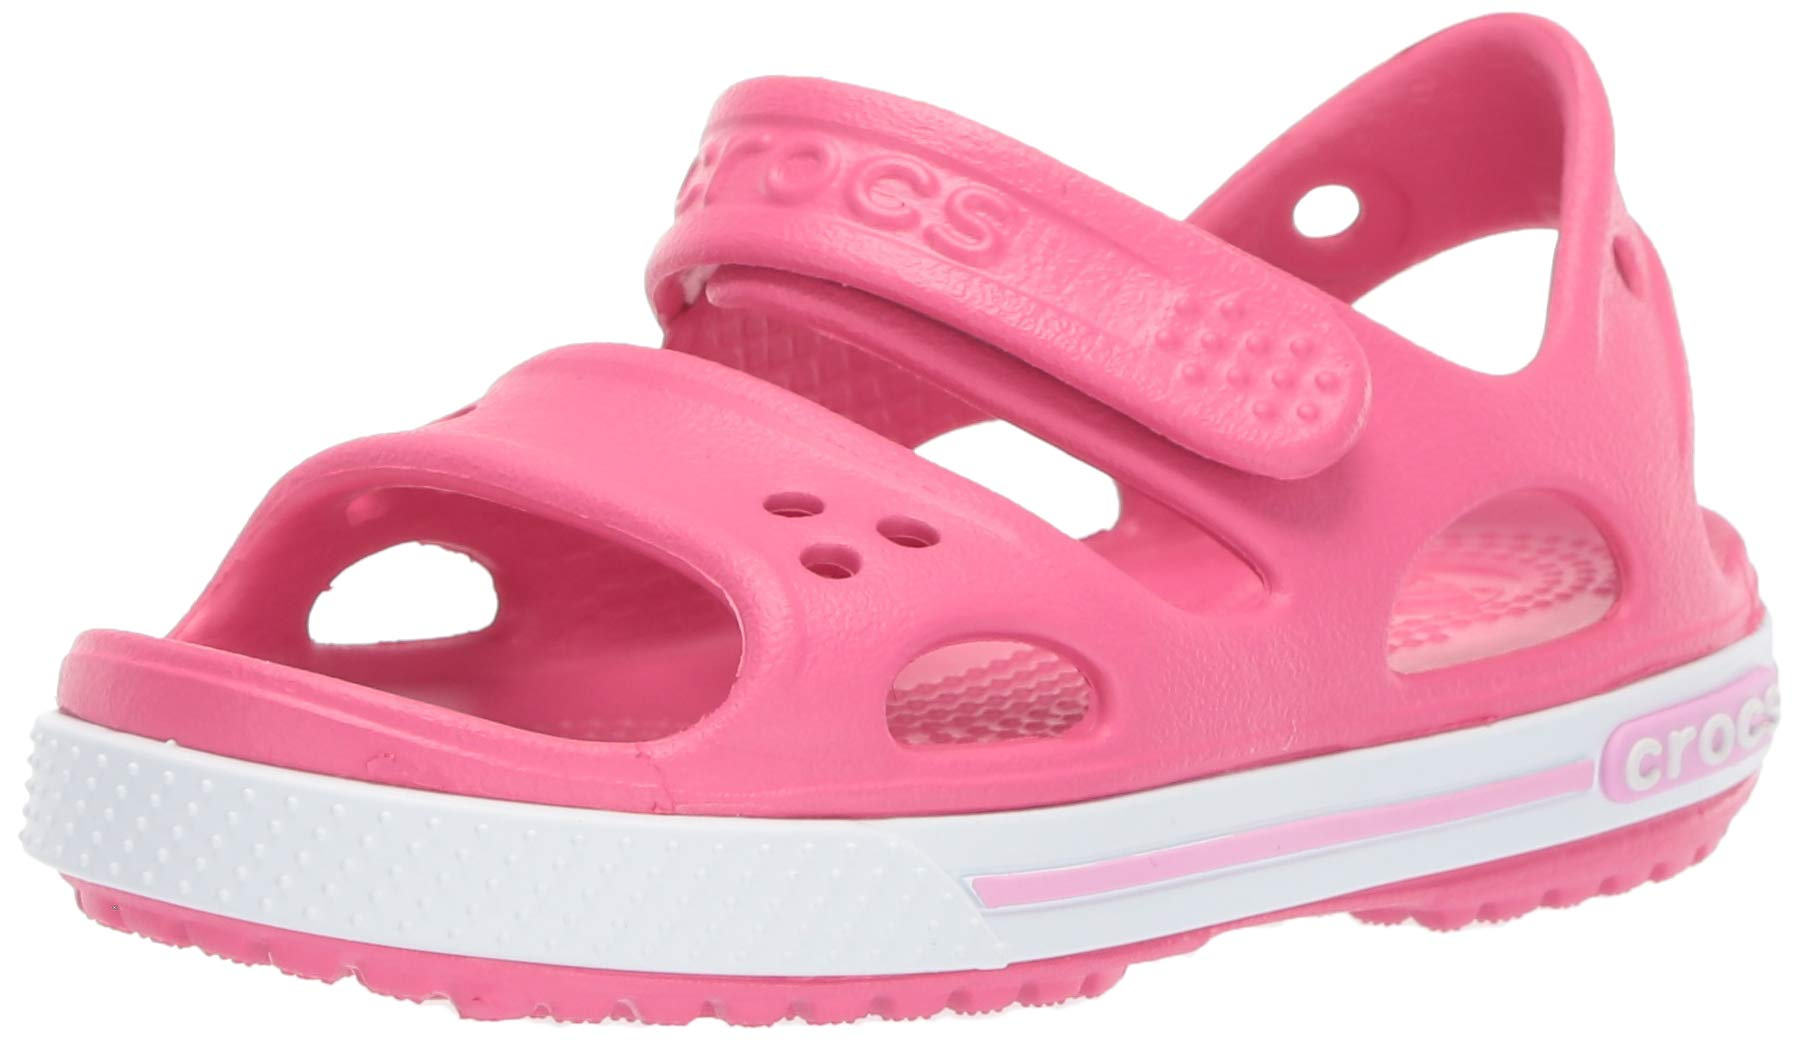 Crocs Kid's Boys and Girls Crocband II Sandal | Pre School, Paradise Pink/Carnation, 9 M US Toddler by Crocs